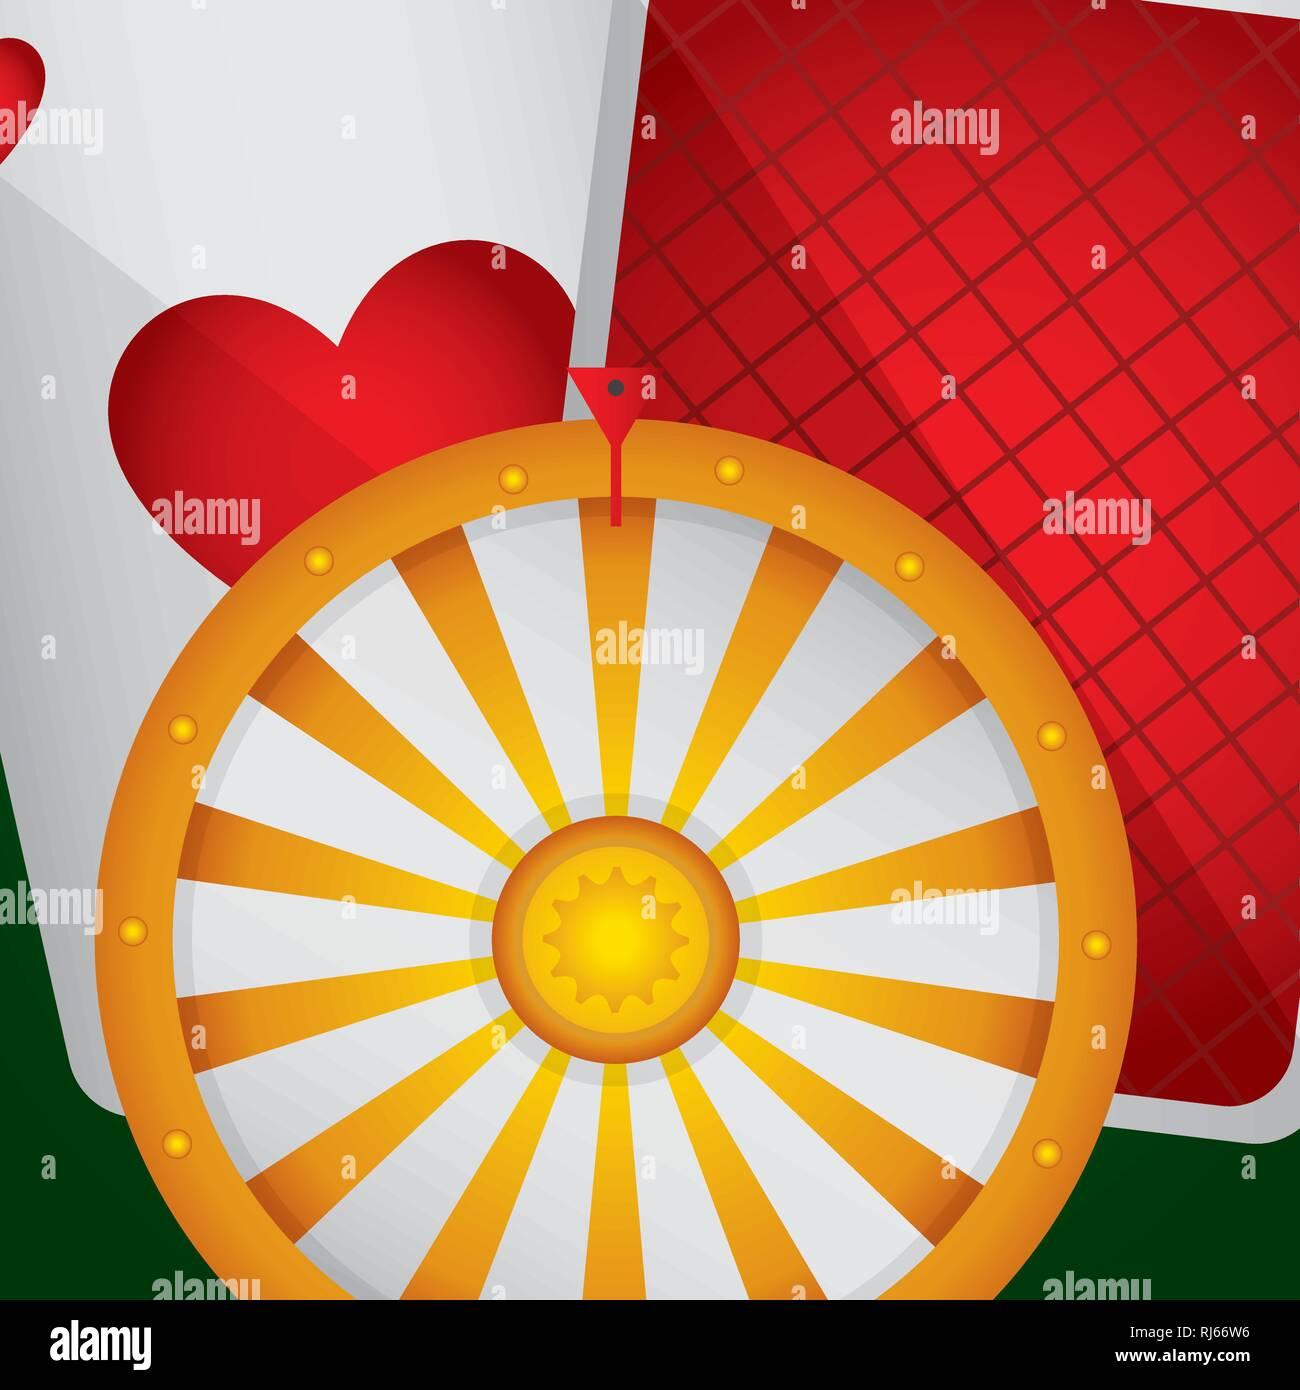 roulette fortune casino icons vector illustration design - Stock Image